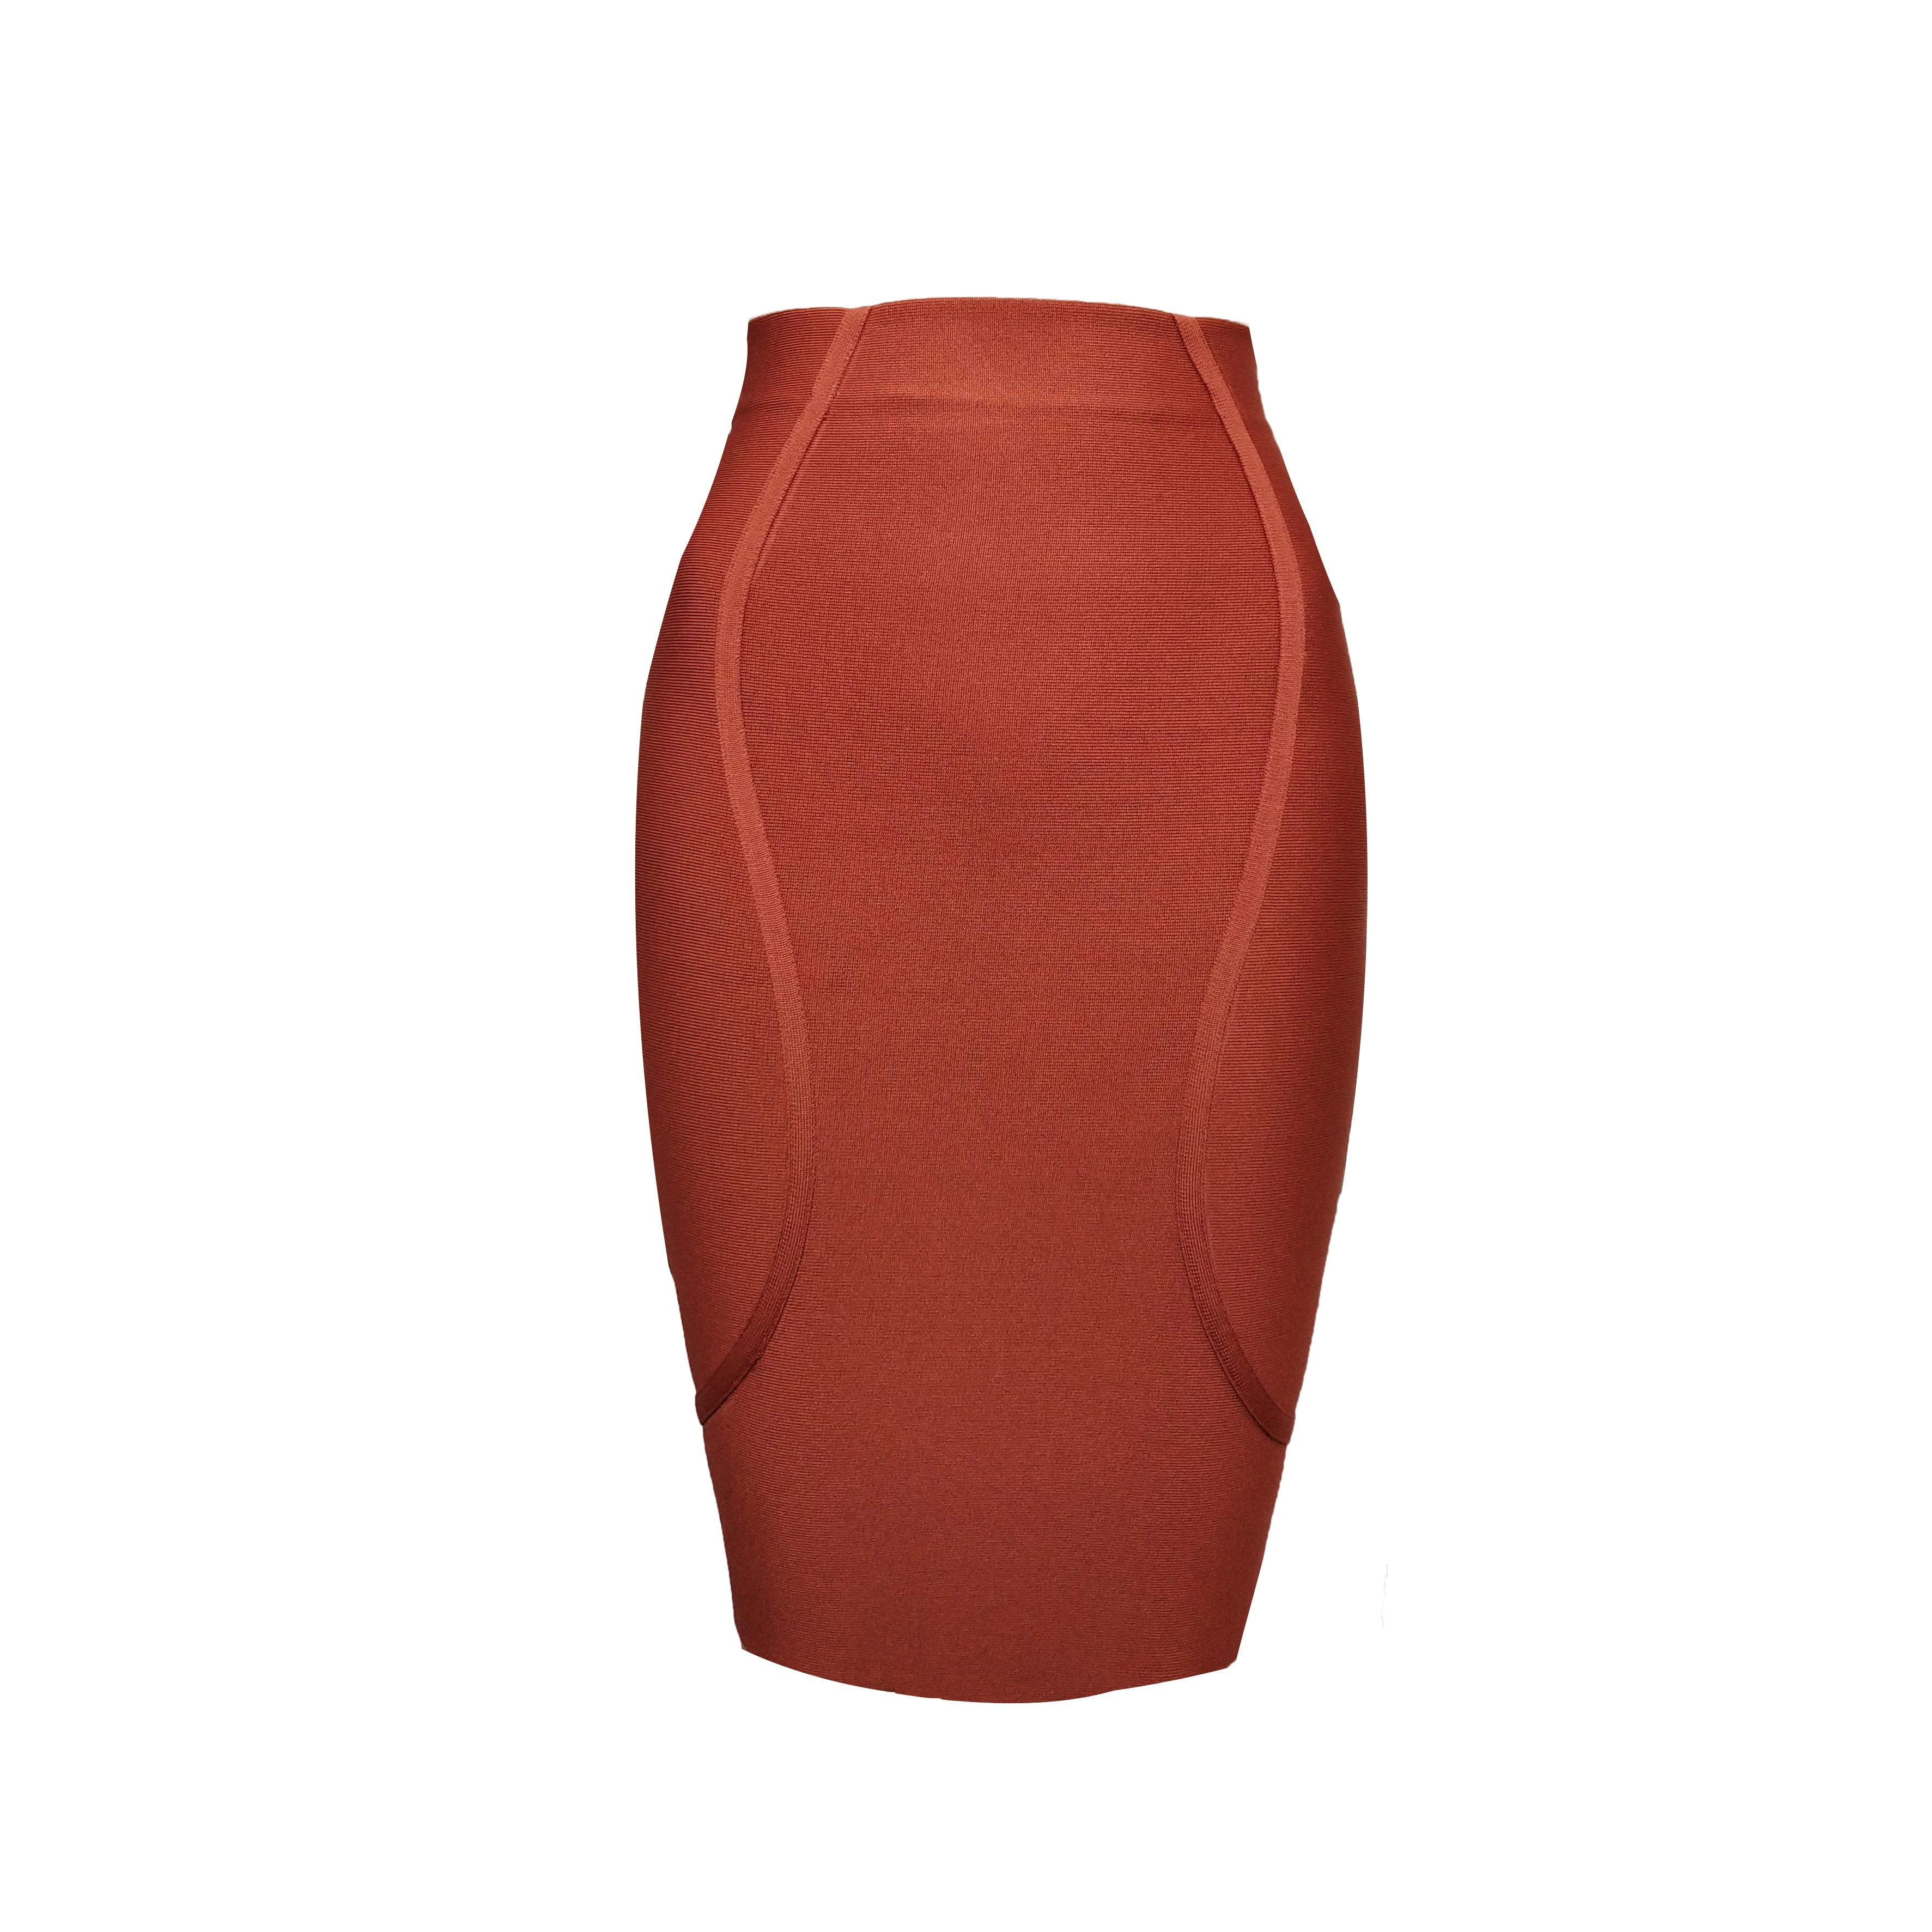 Bandage Skirt Womens Mini Skirt Winter Sexy Woman Clothes Short Harajuku Women Skirts 2019 New Bodycon 2